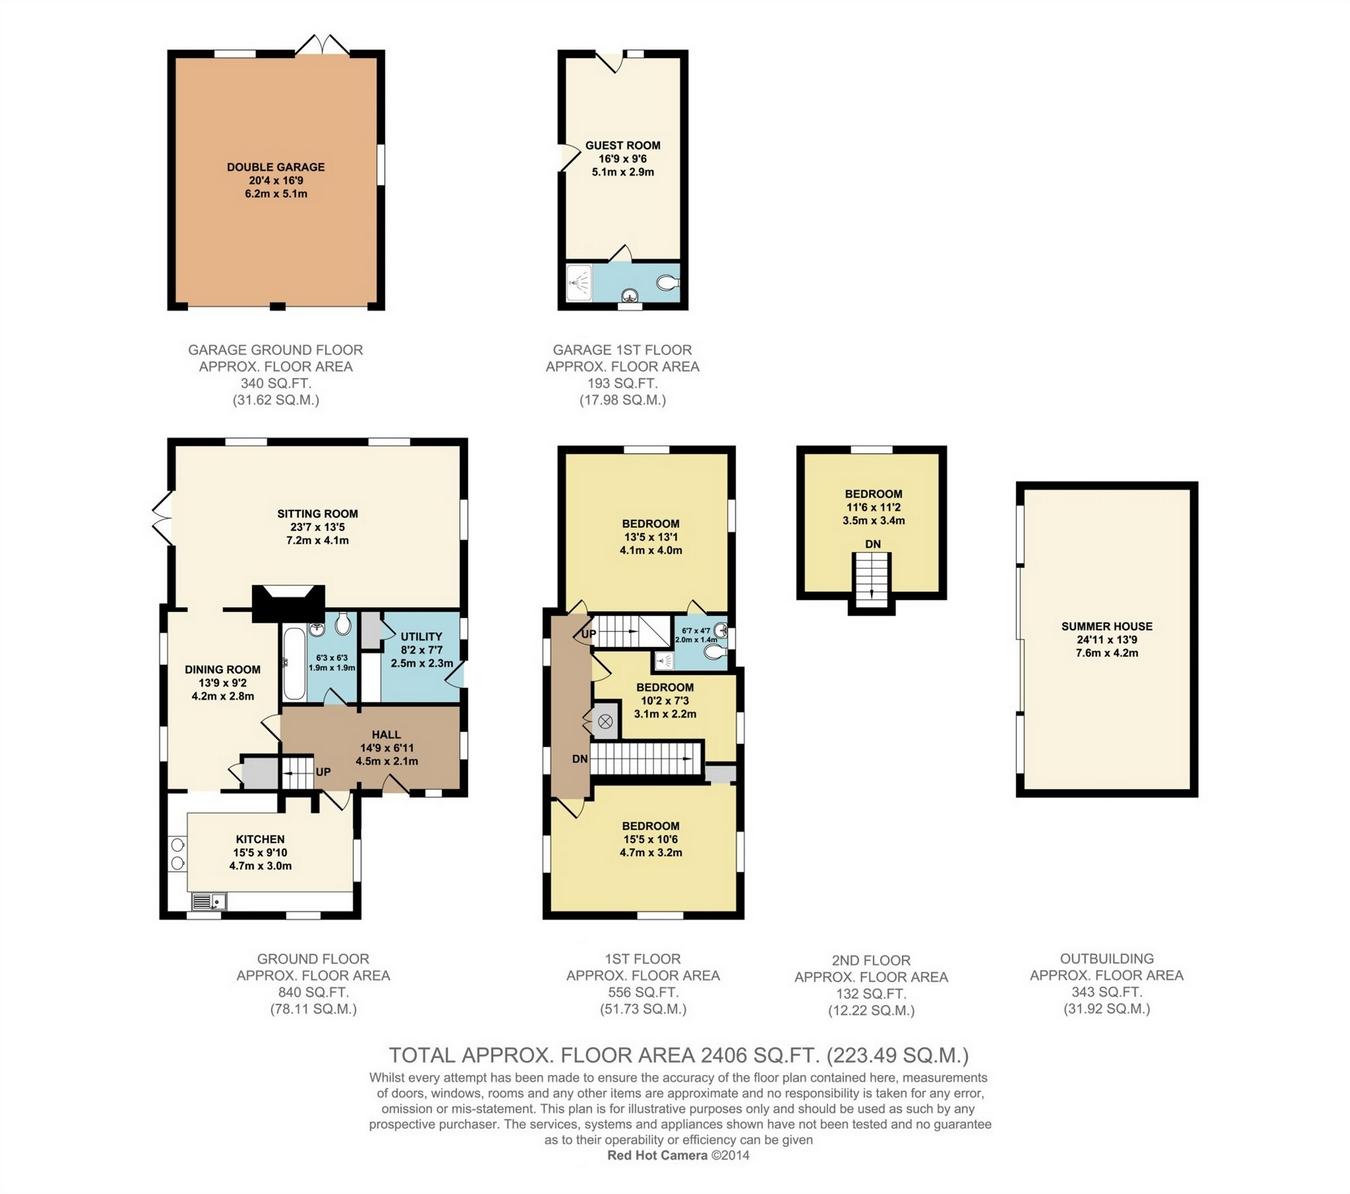 Manor farm oast love lane headcorn kent tn27 5 bedroom for The headcorn minimalist house kent